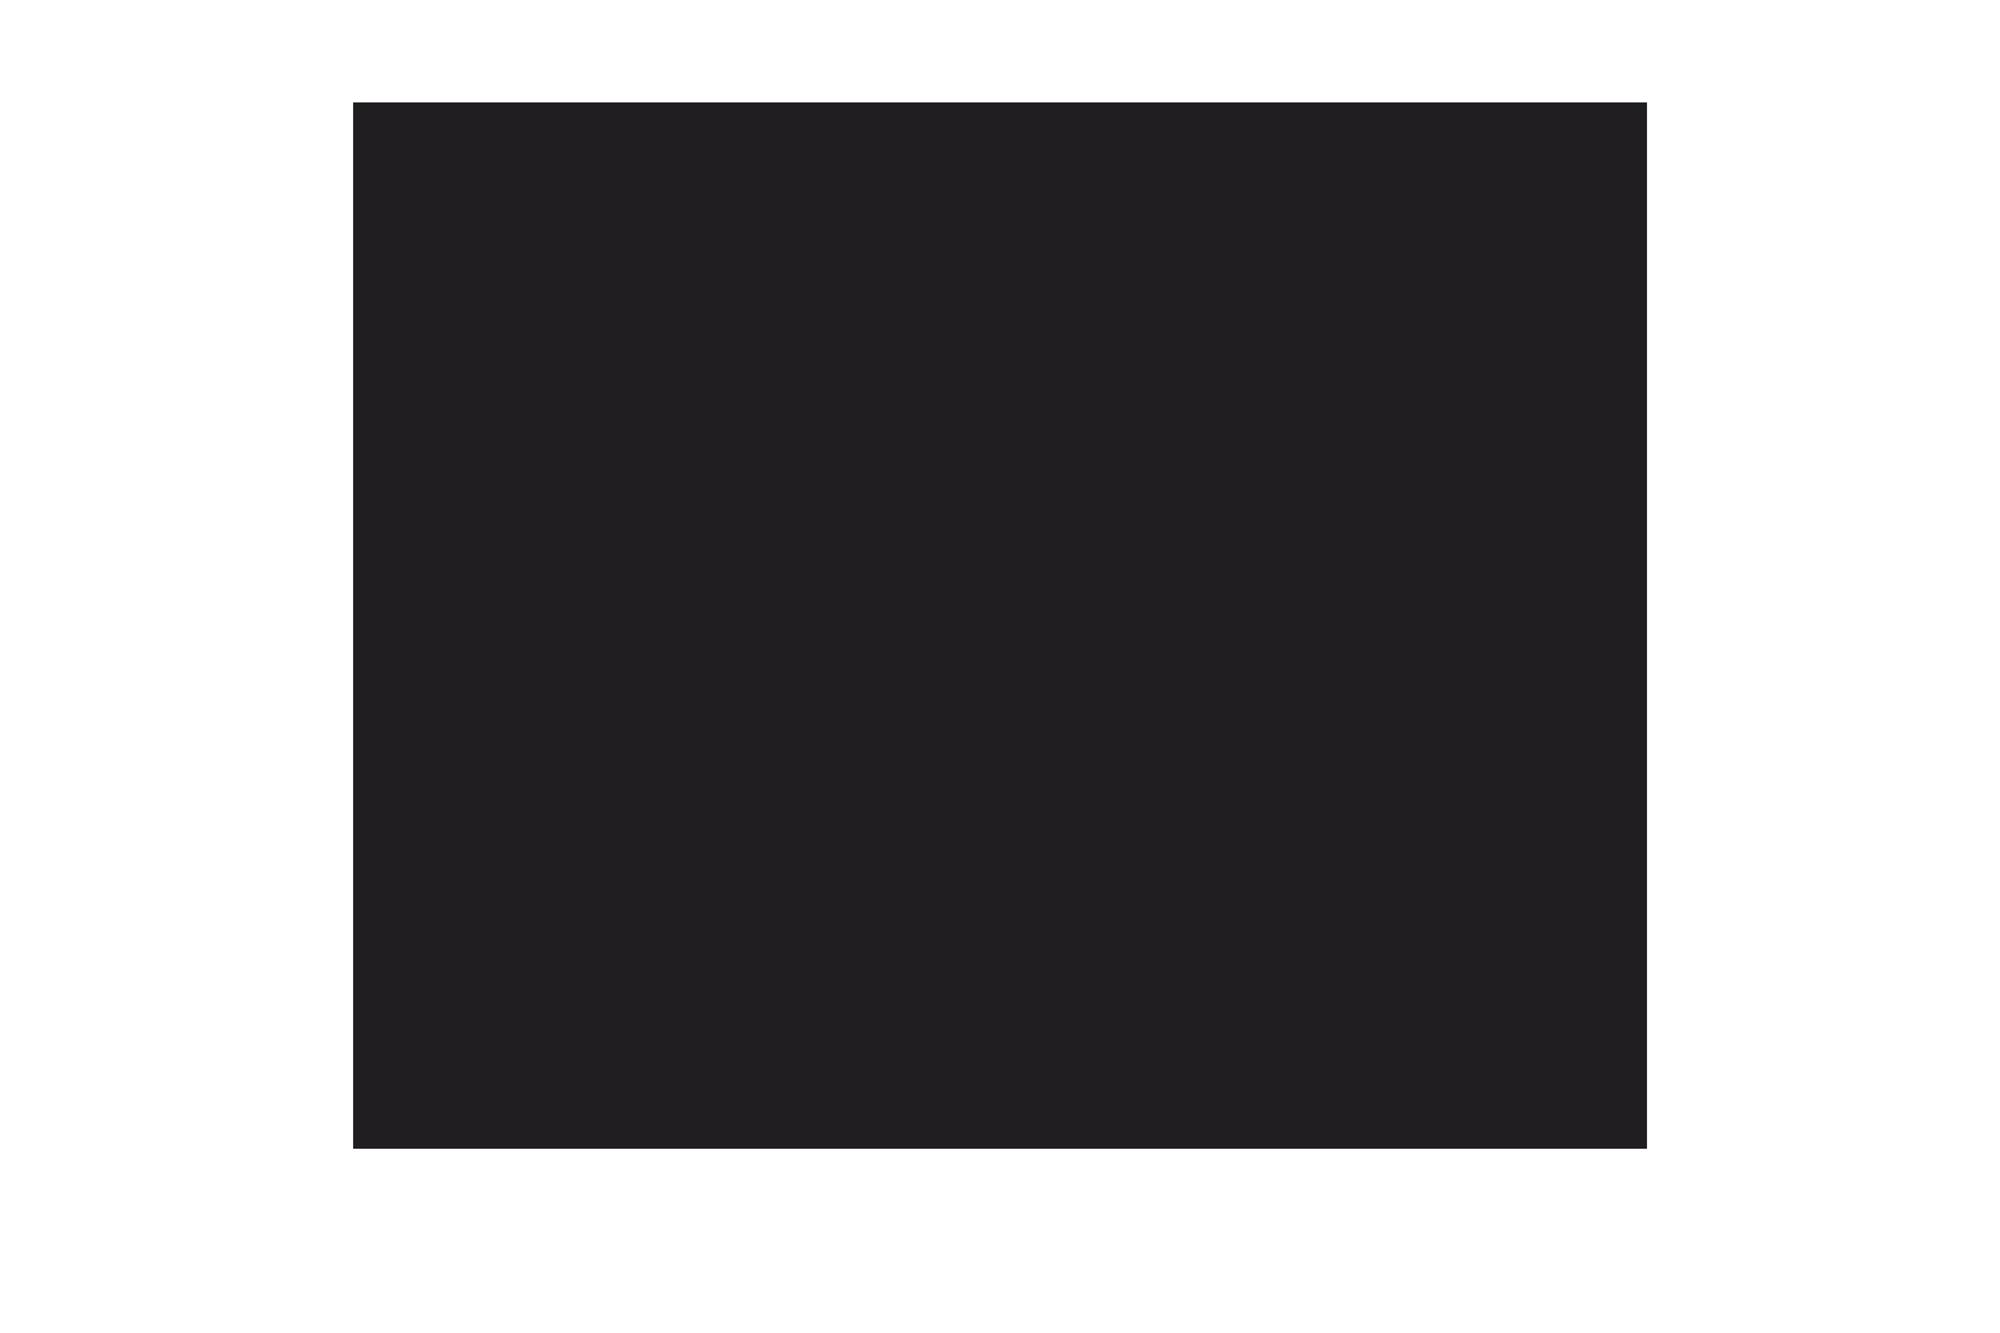 Lucas de Staël - Stratus 11